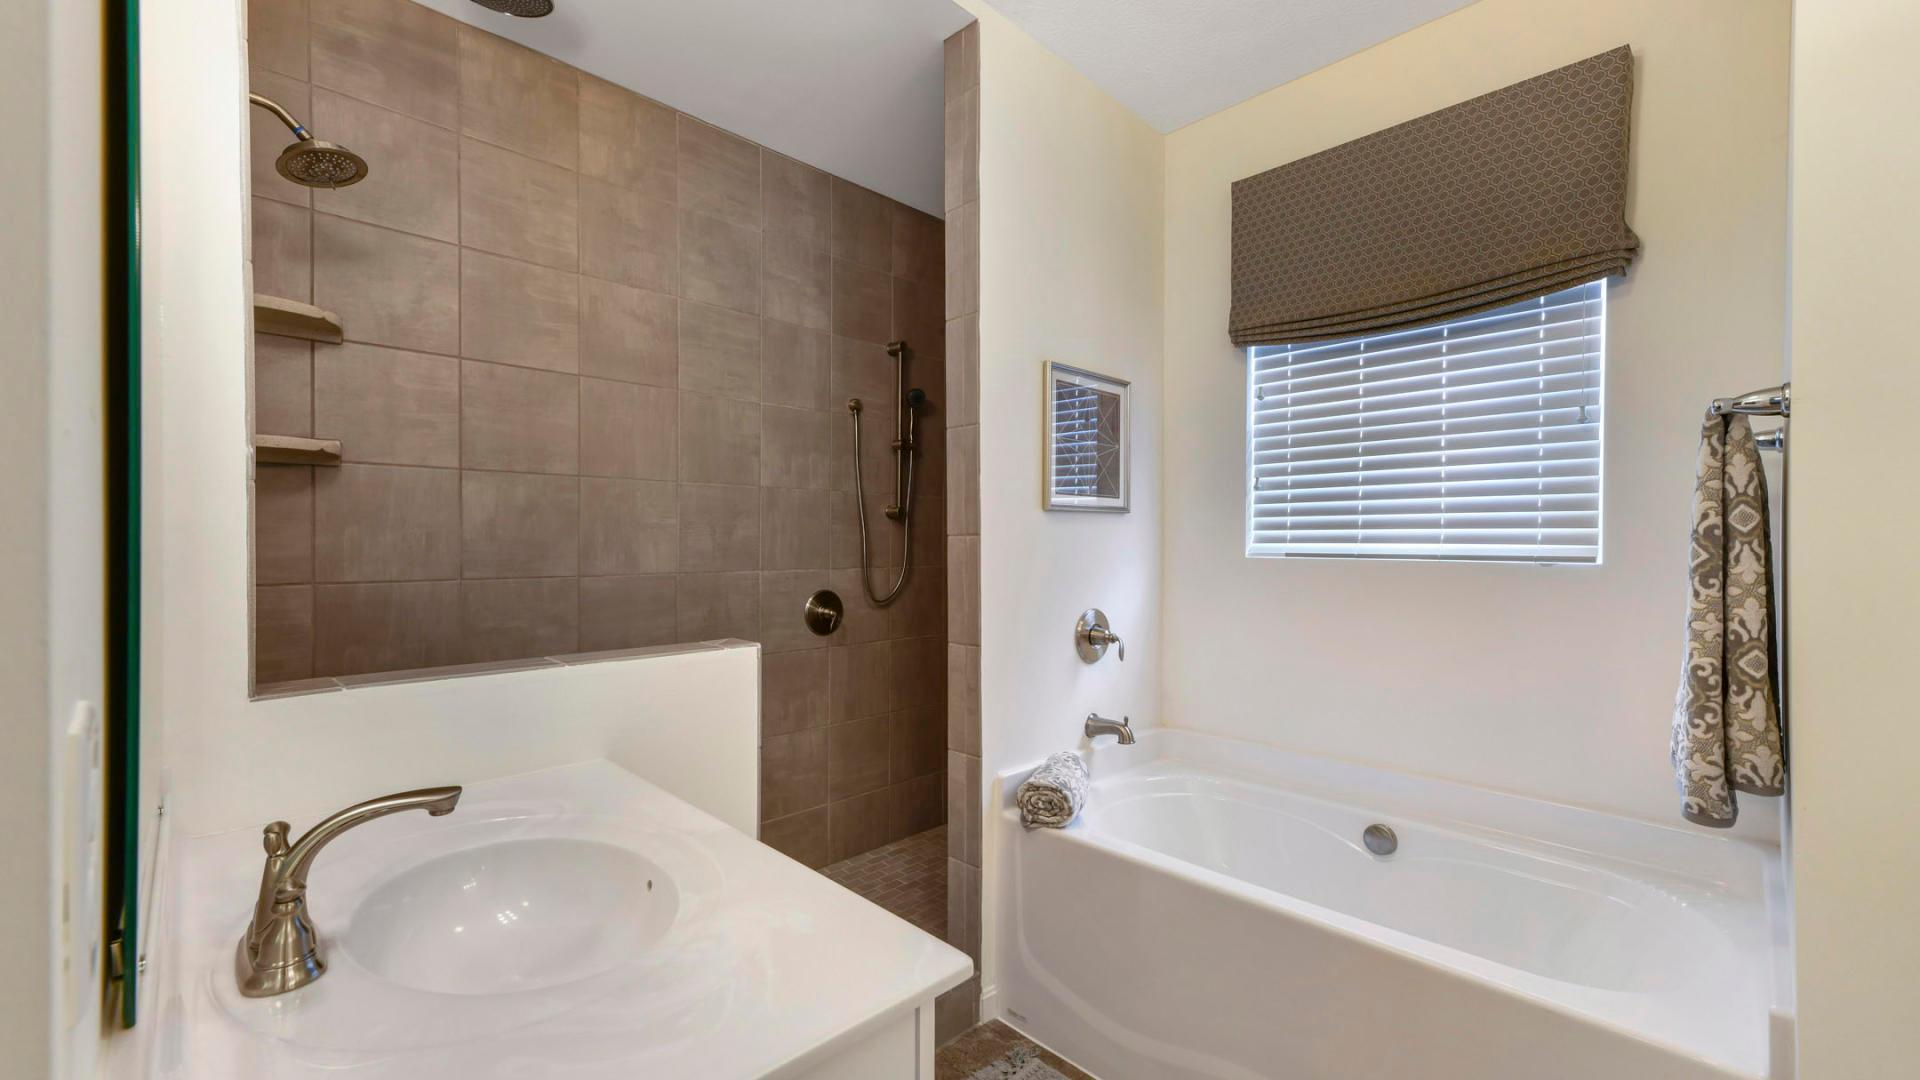 Bathroom featured in the Wilmington By Maronda Homes in Cincinnati, OH